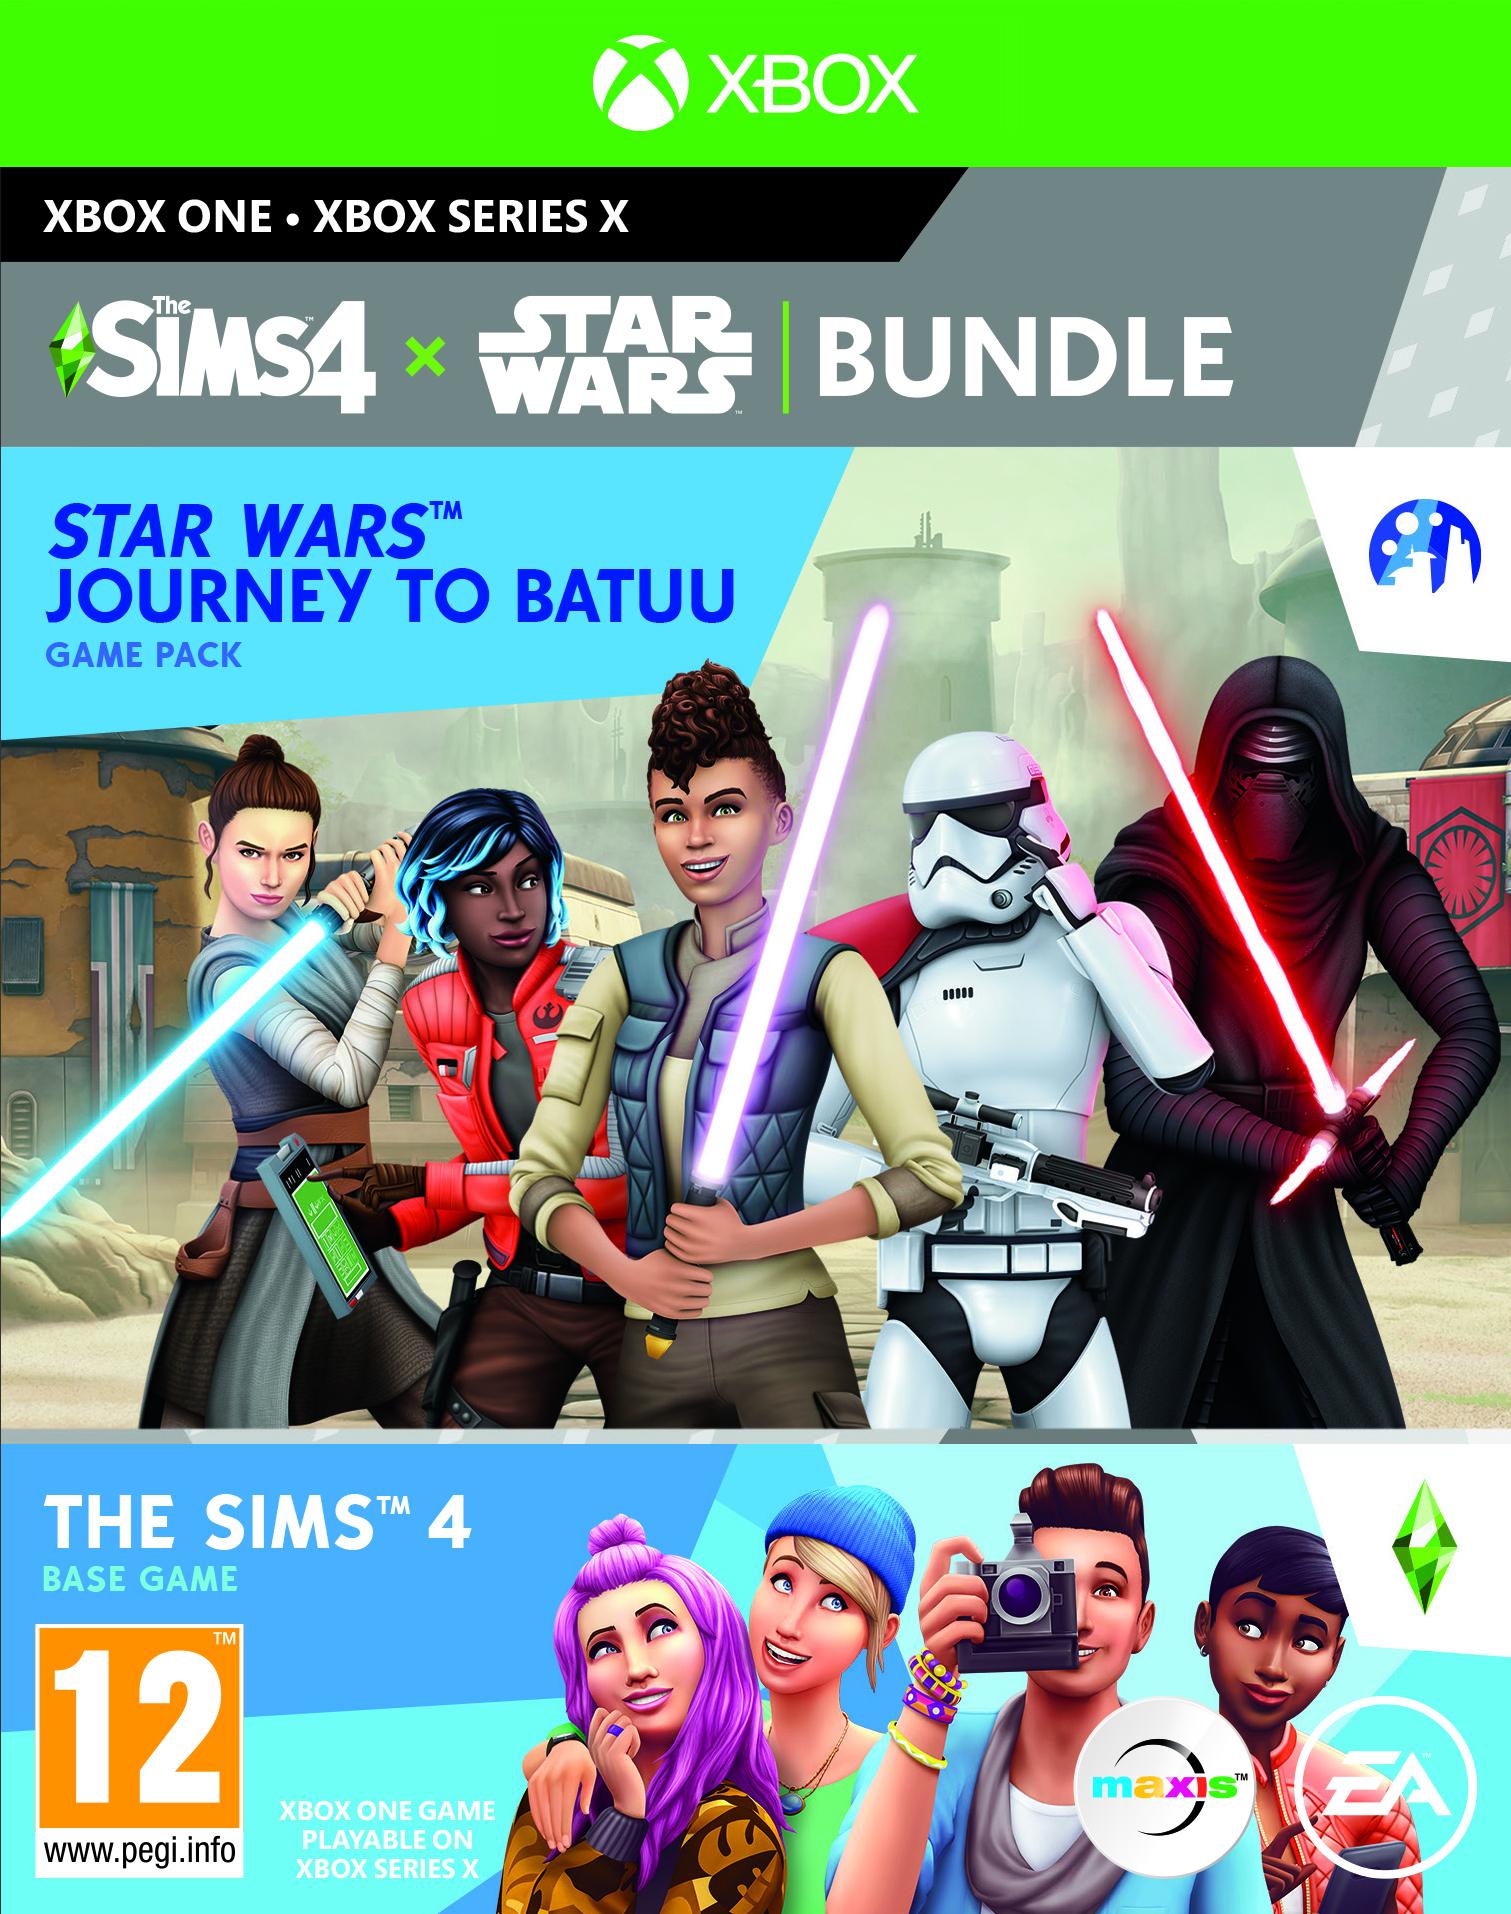 XONE - The Sims 4 + Star Wars - bundle